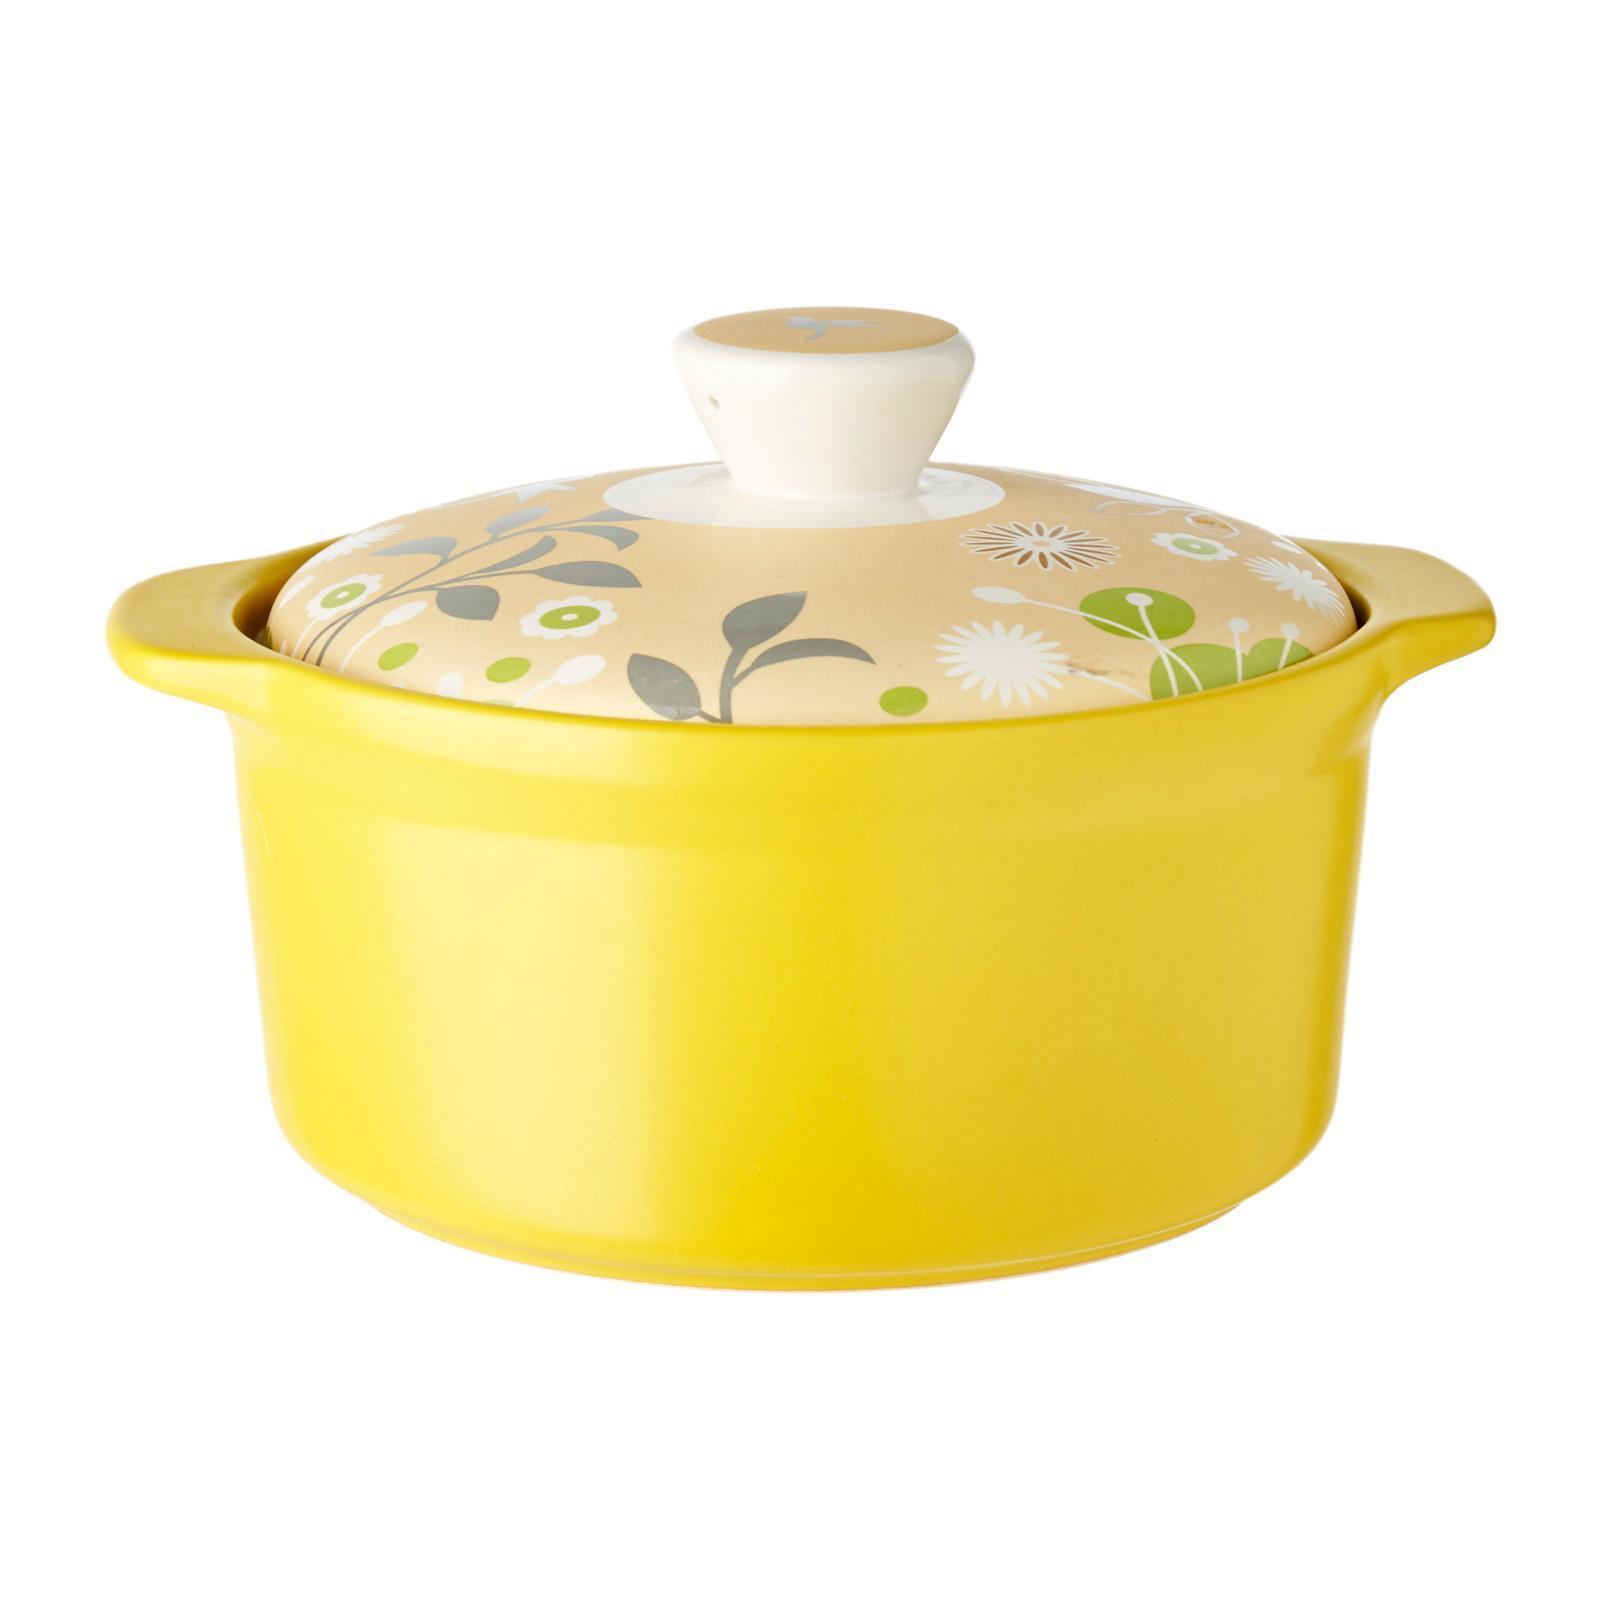 Cera Vita Ceramic Casserole Forest Hills - Yellow 1.3L